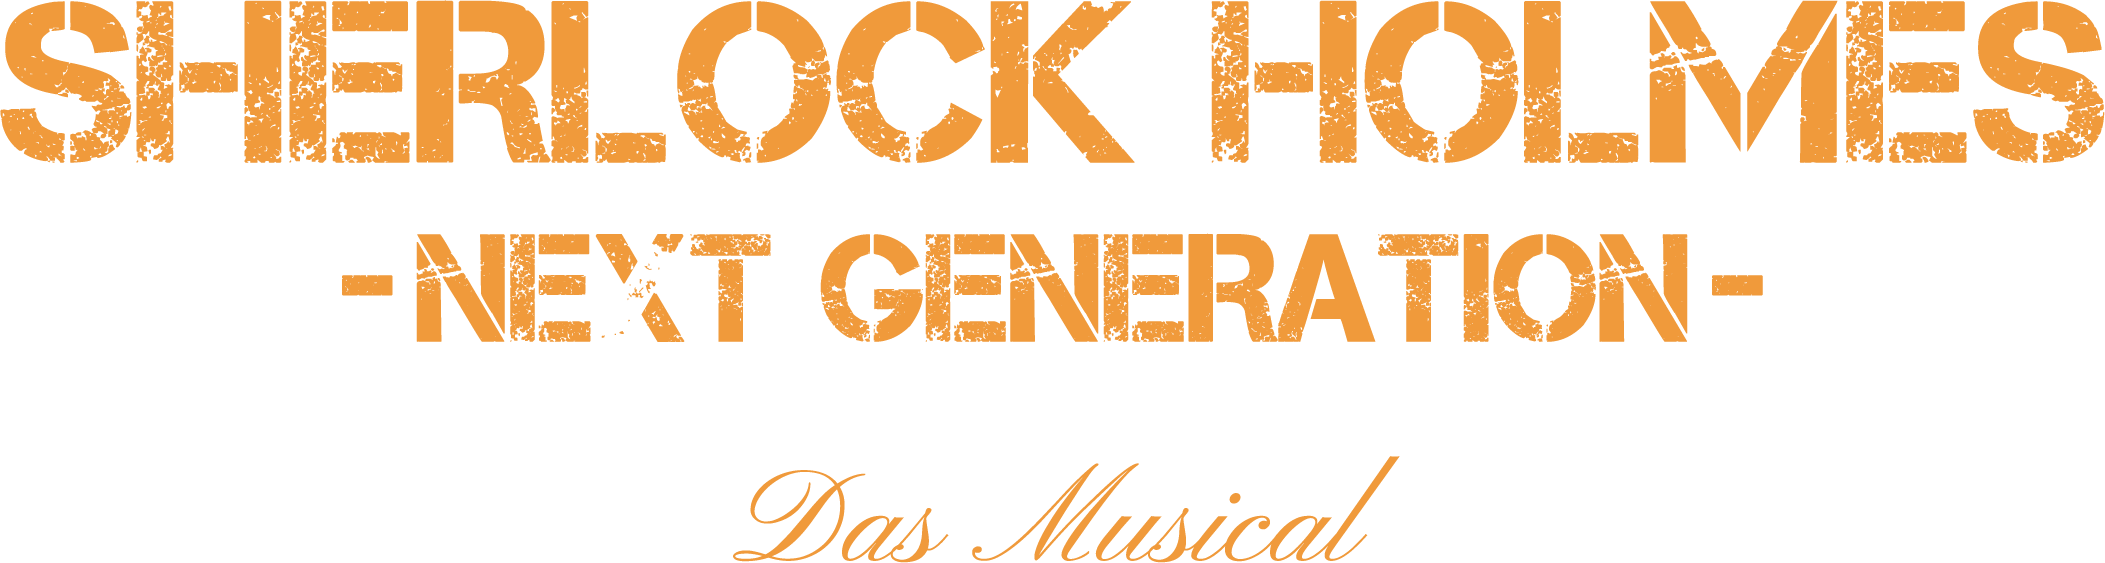 Sherlock Holmes - Next Generation - Das Musical